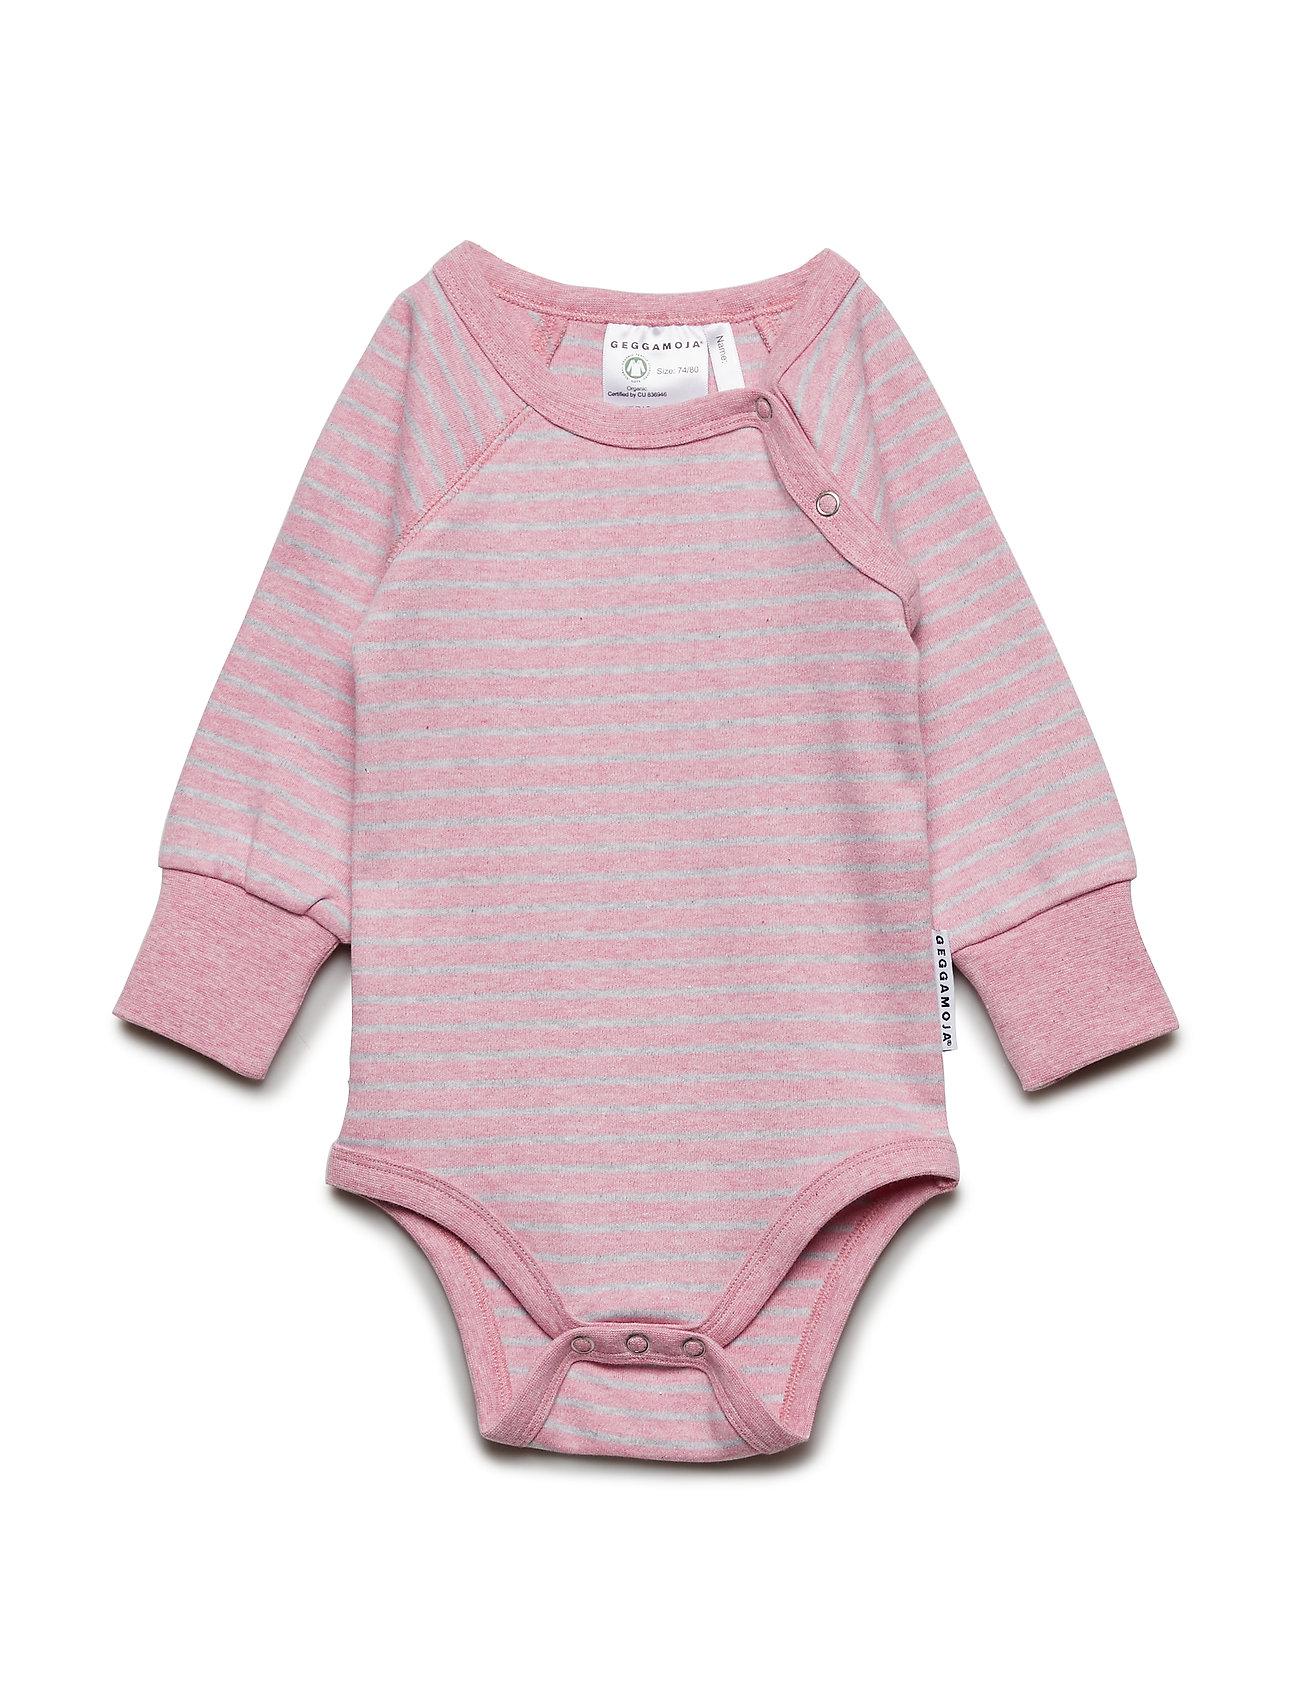 Geggamoja Baby Body Classic - PINK DAISY STRIPE